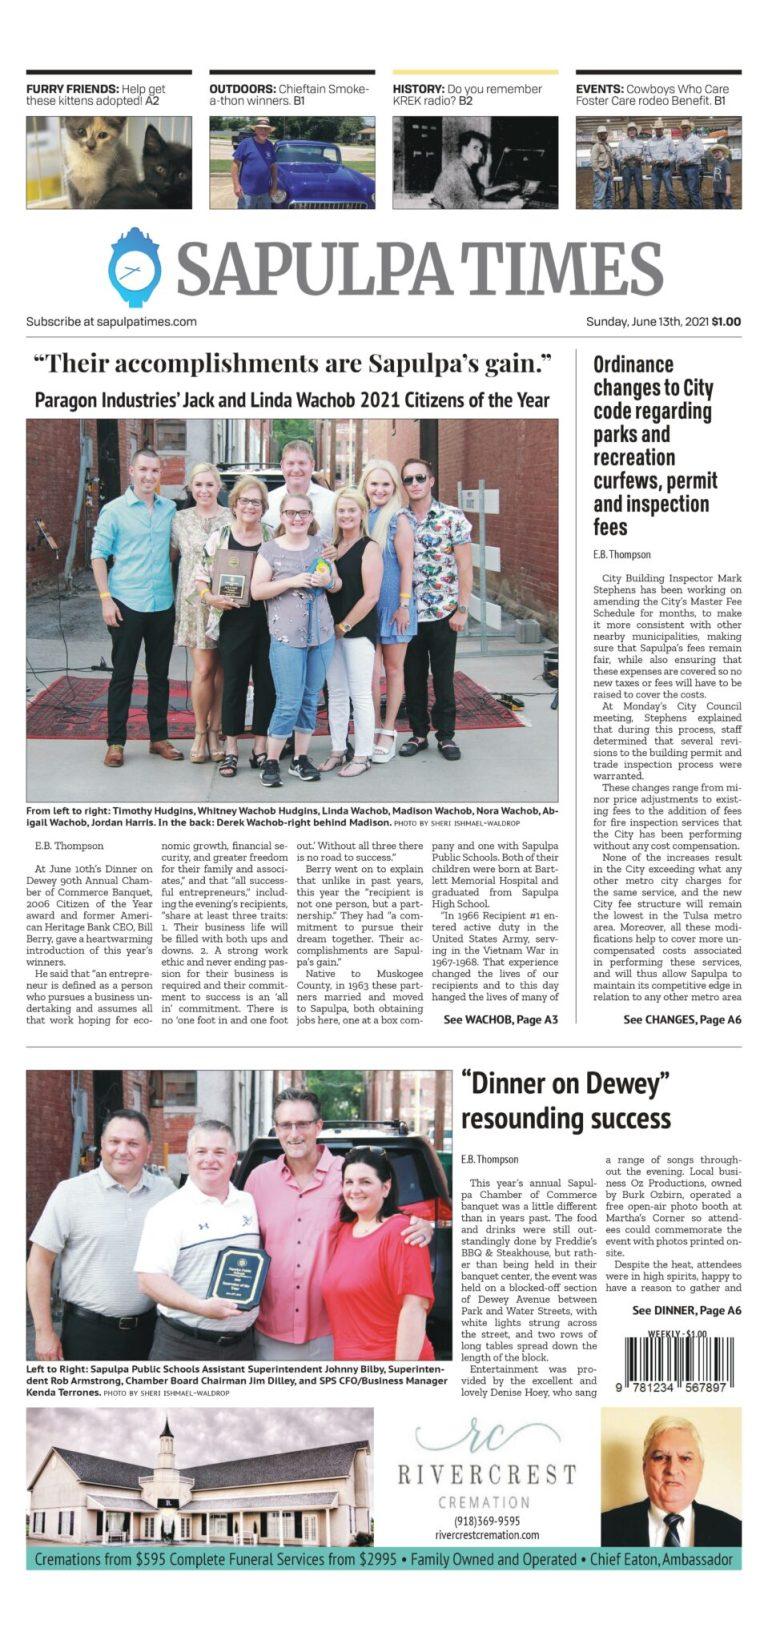 Sapulpa Times Digital Edition 06/13/2021